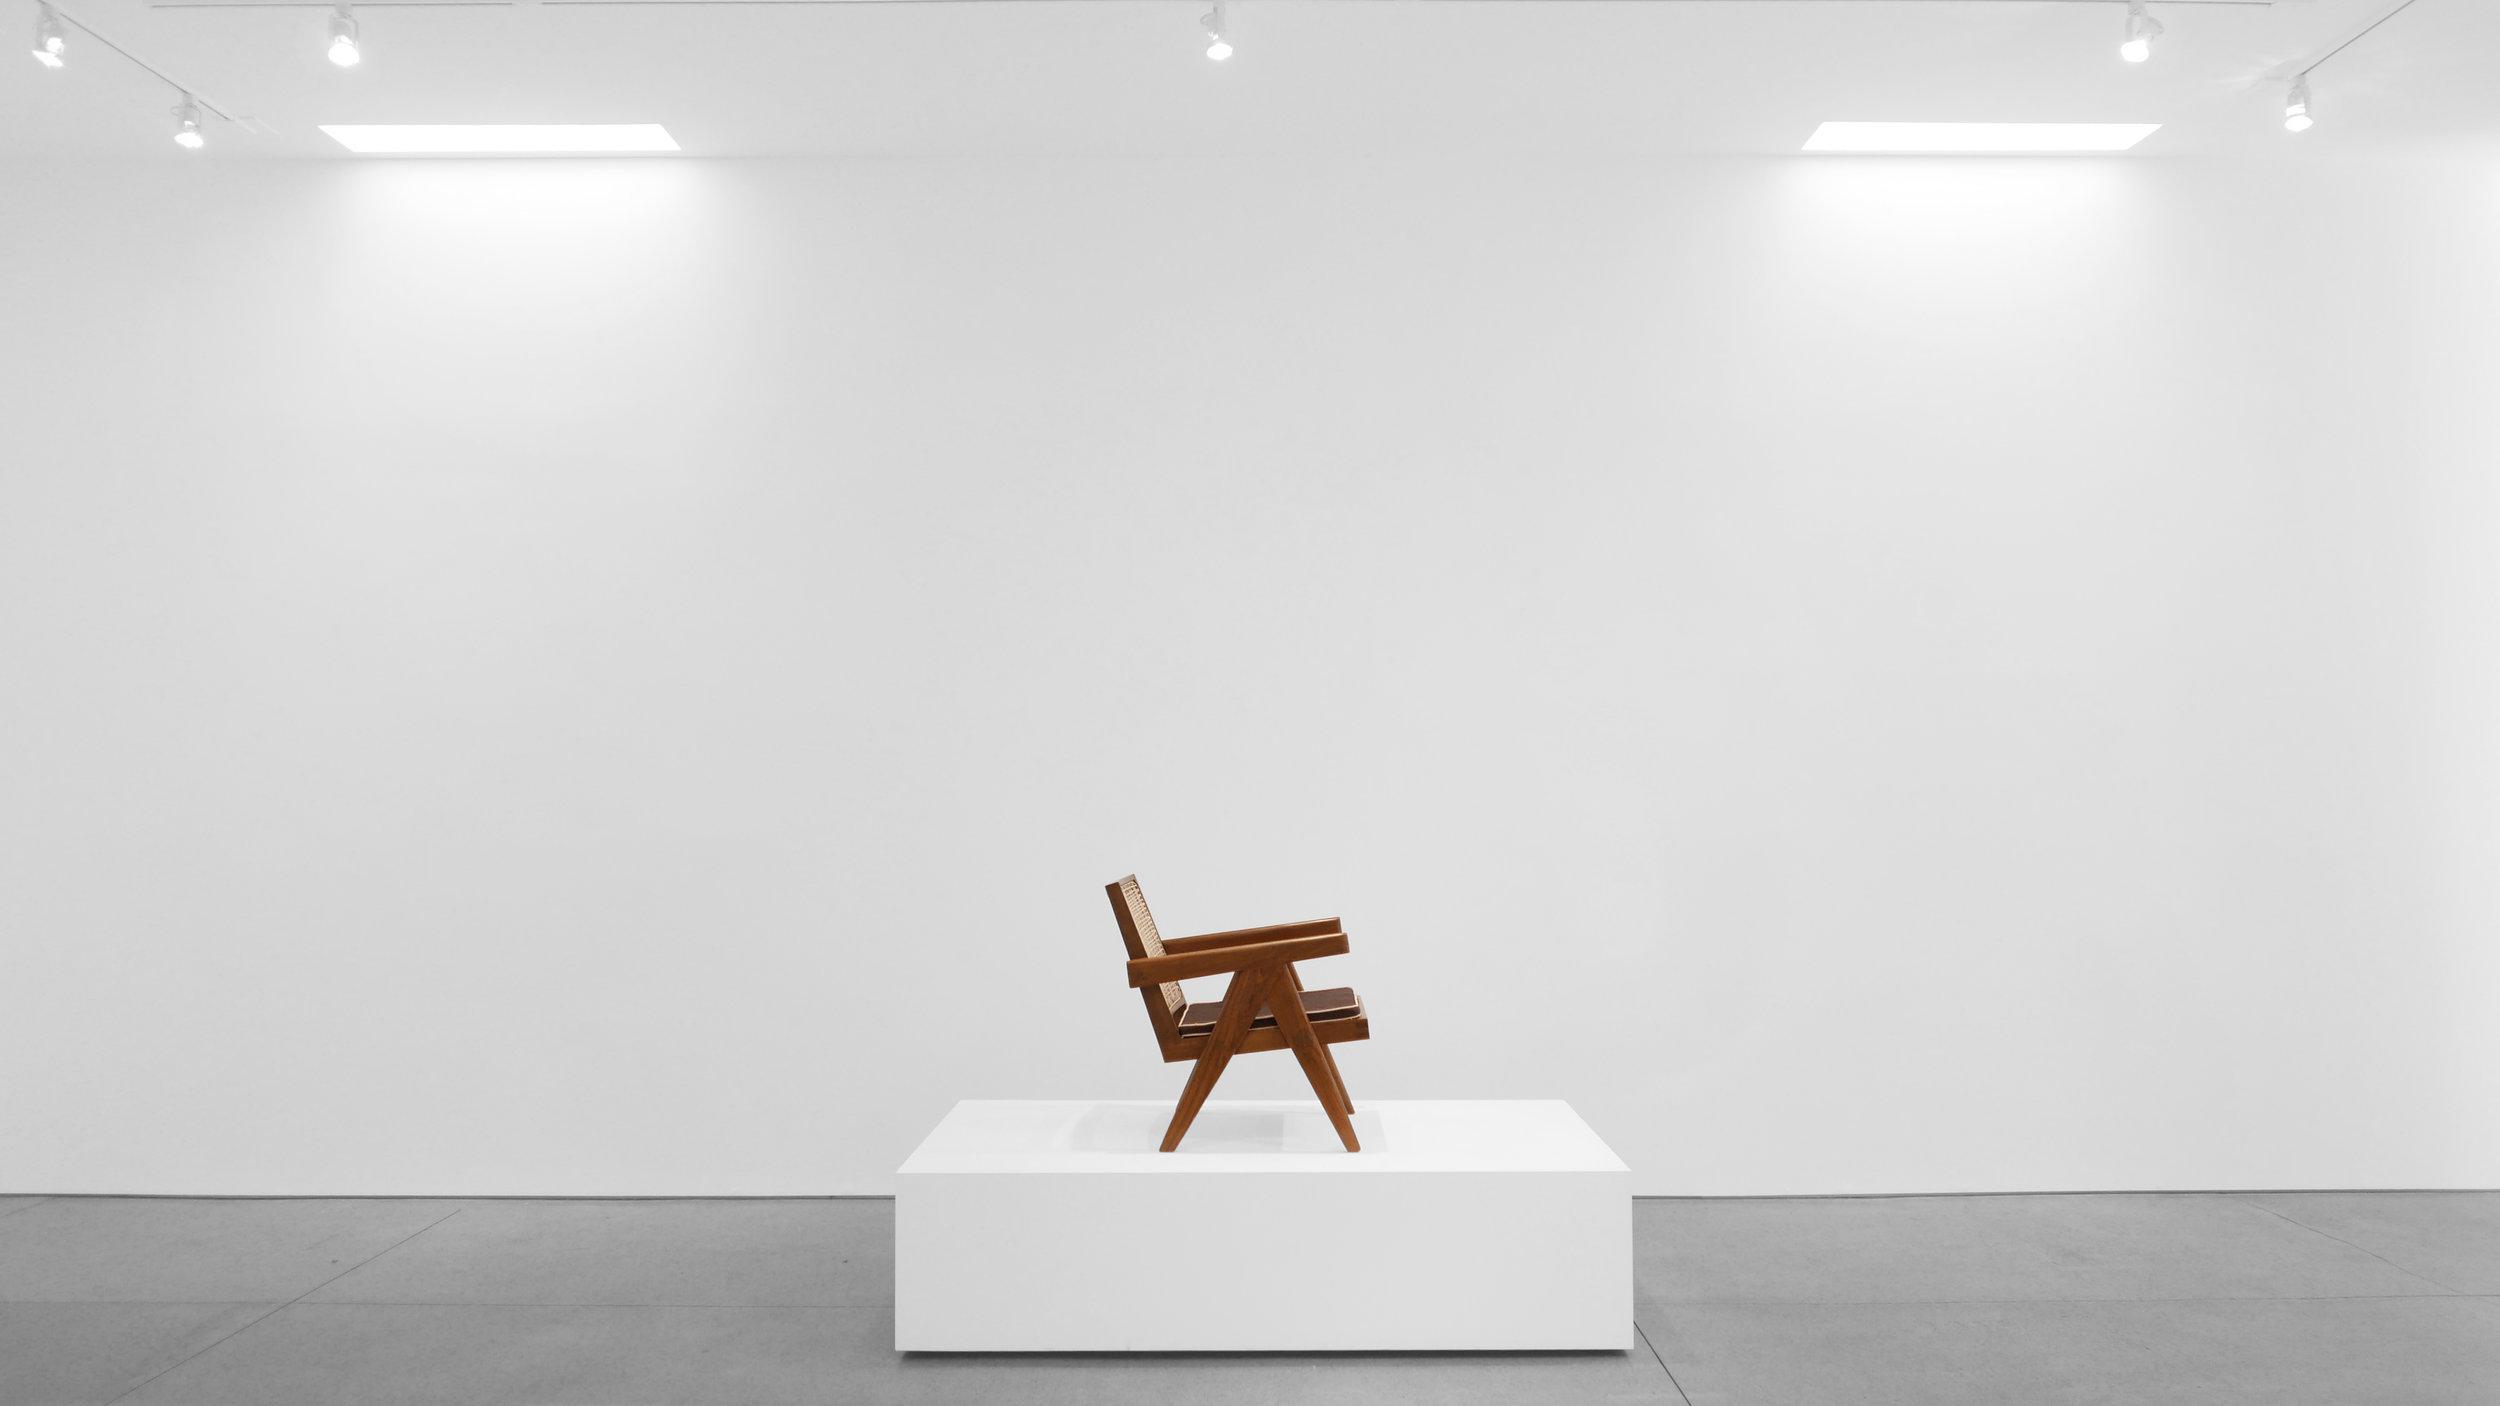 Pierre Jeanneret, Low lounge chair, model PJ-SI-29-A, c. 1955, teak, cane, 24.5H x 20.5W x 29.5D inches_4.jpg